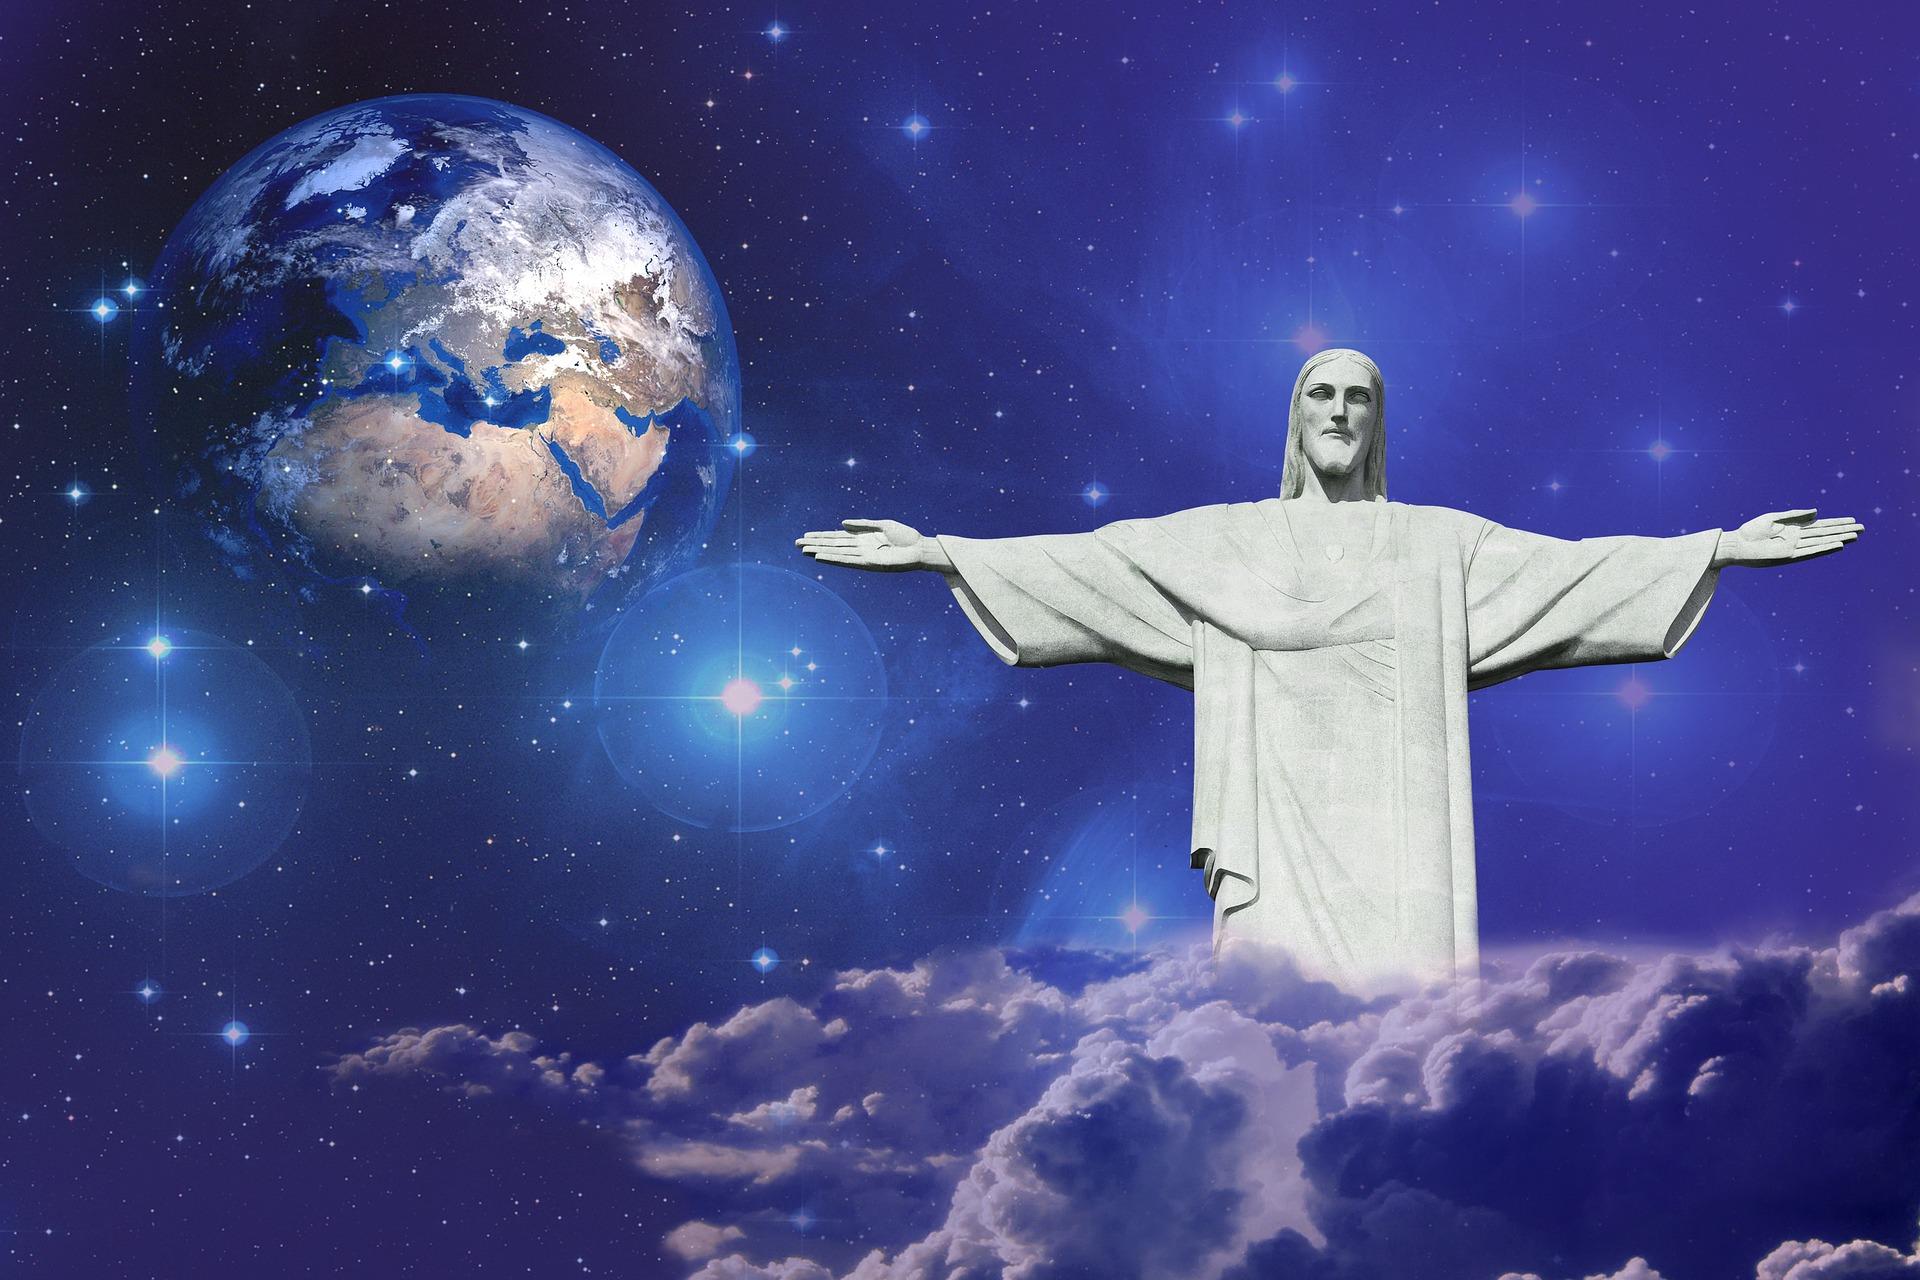 jesus' ascension establishes humanity's true destiny in heaven